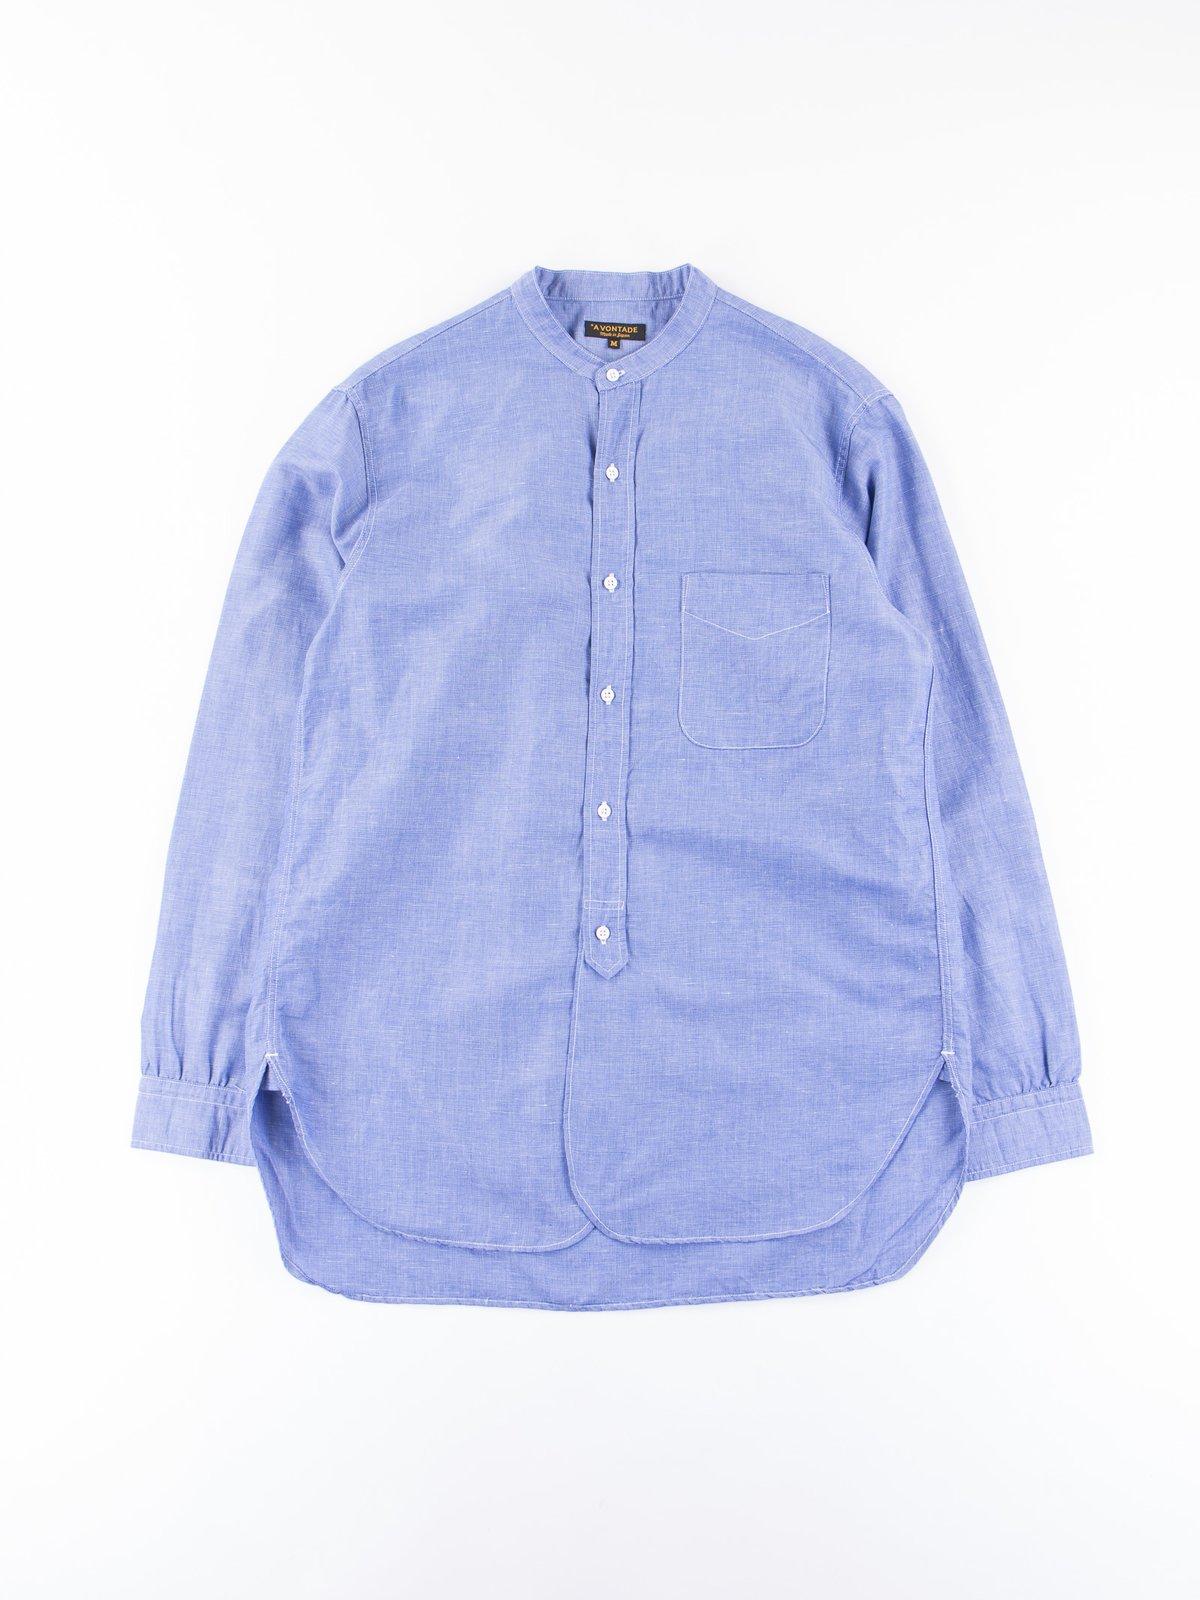 Blue End on End Banded Collar Shirt - Image 1